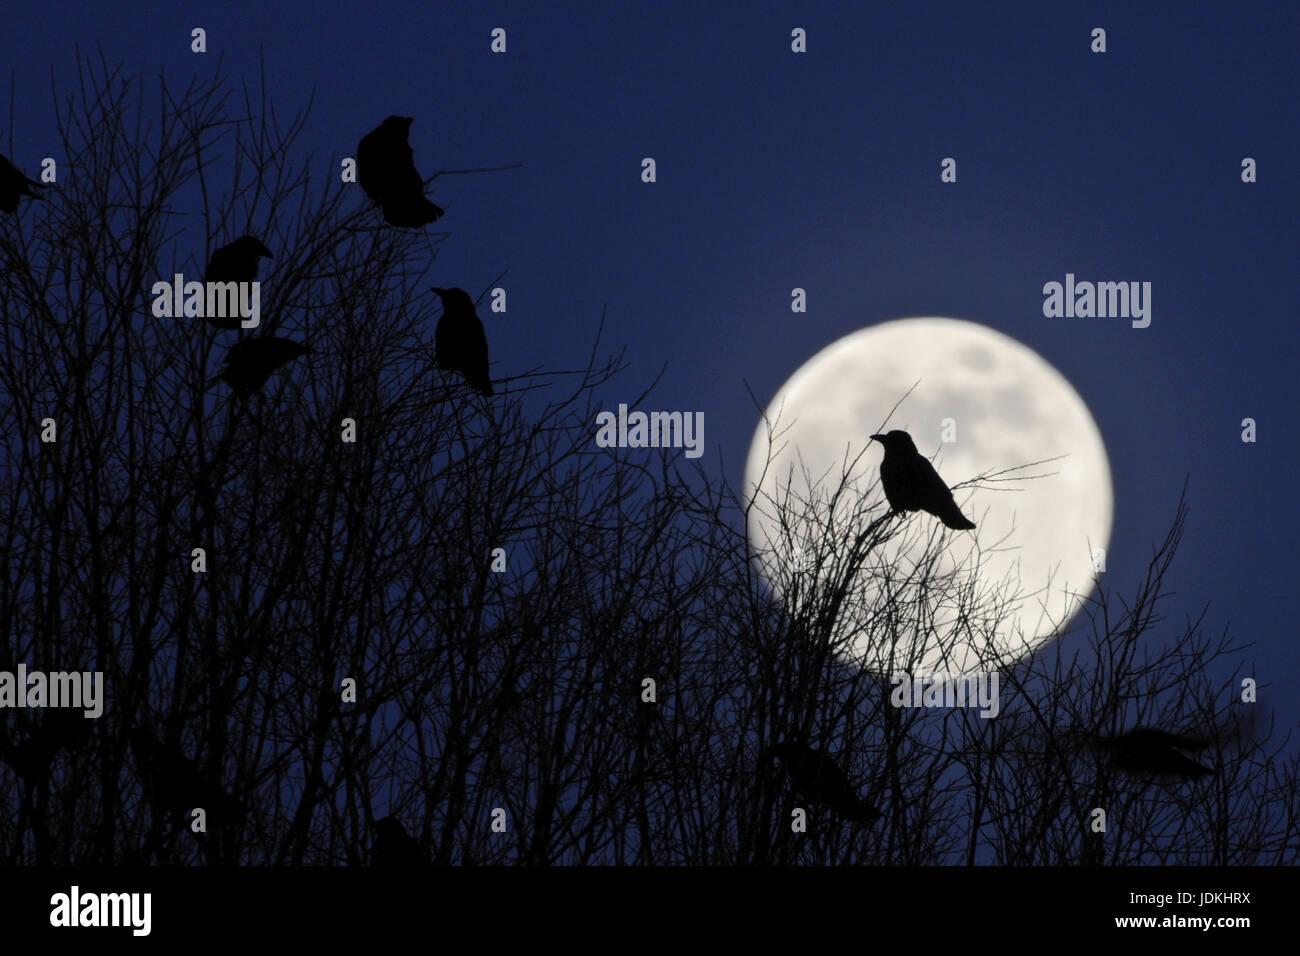 'Animal; animals; bird; birds; crow; rook; silhouette; full moon; night admission; cemetery; Rook; Corvus frugilegus', - Stock Image